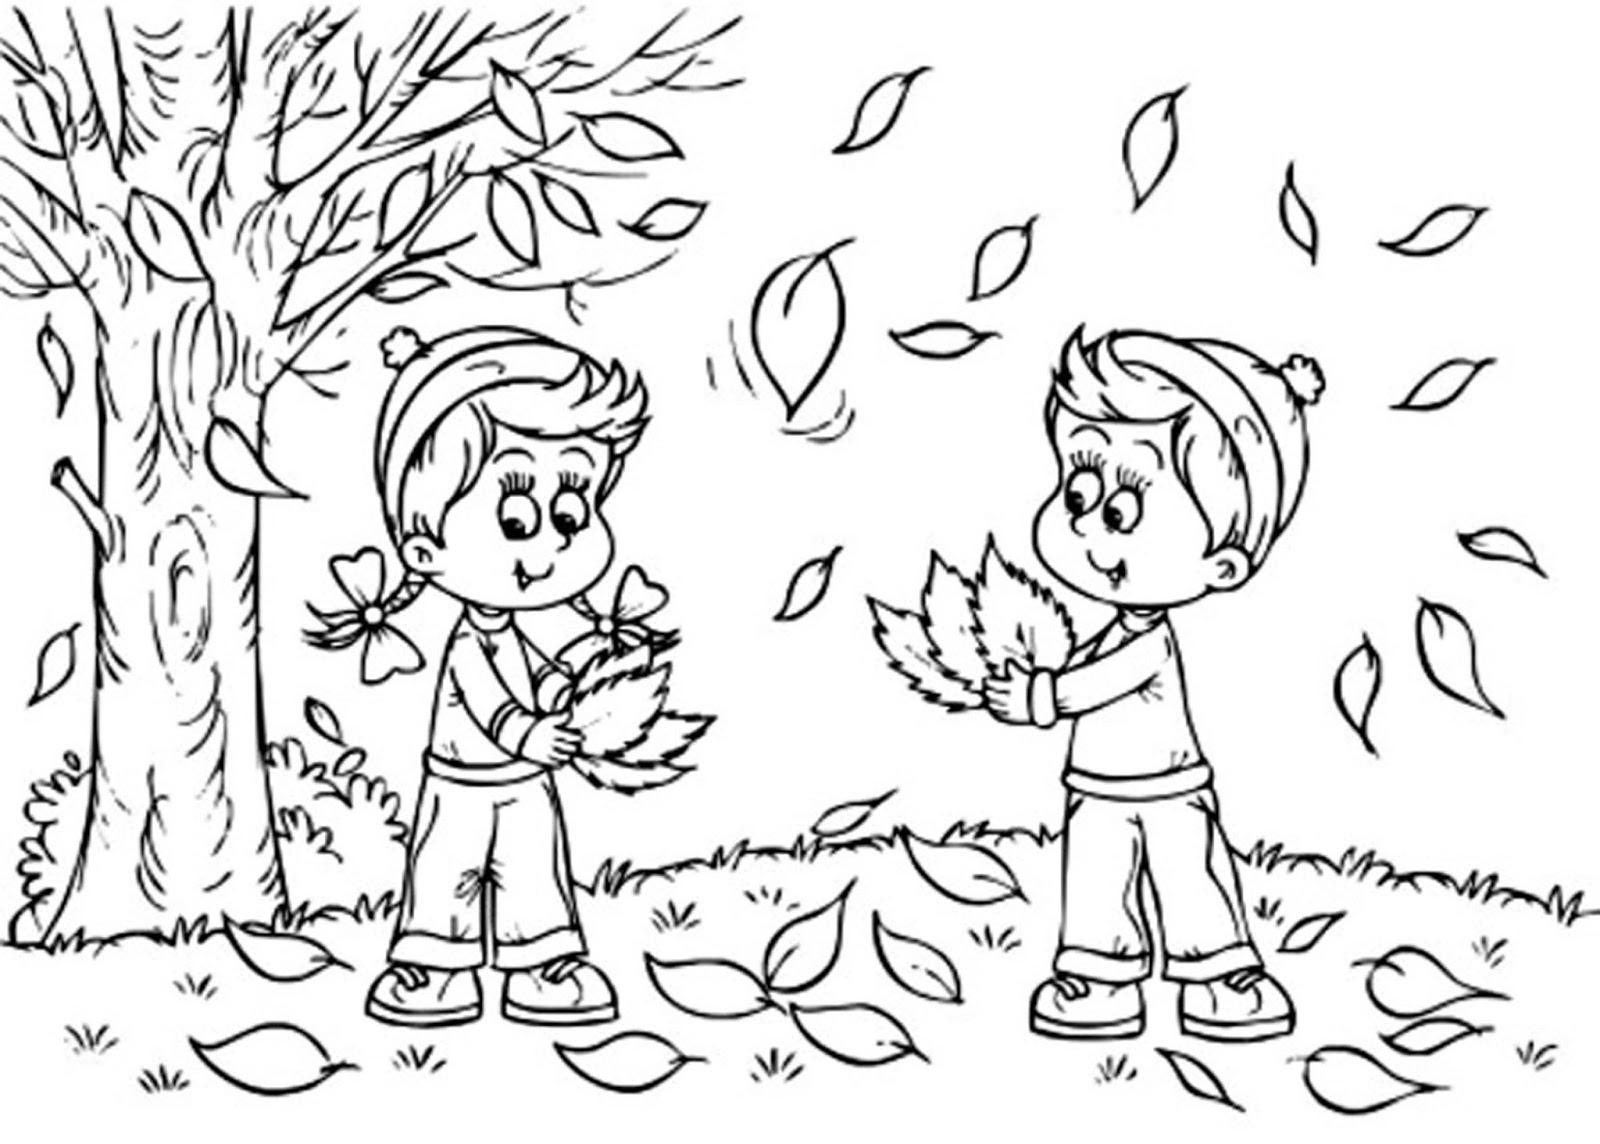 Coloring Pages For Autumn Season - Dheashintiapriliani - Free Printable Coloring Pages Fall Season